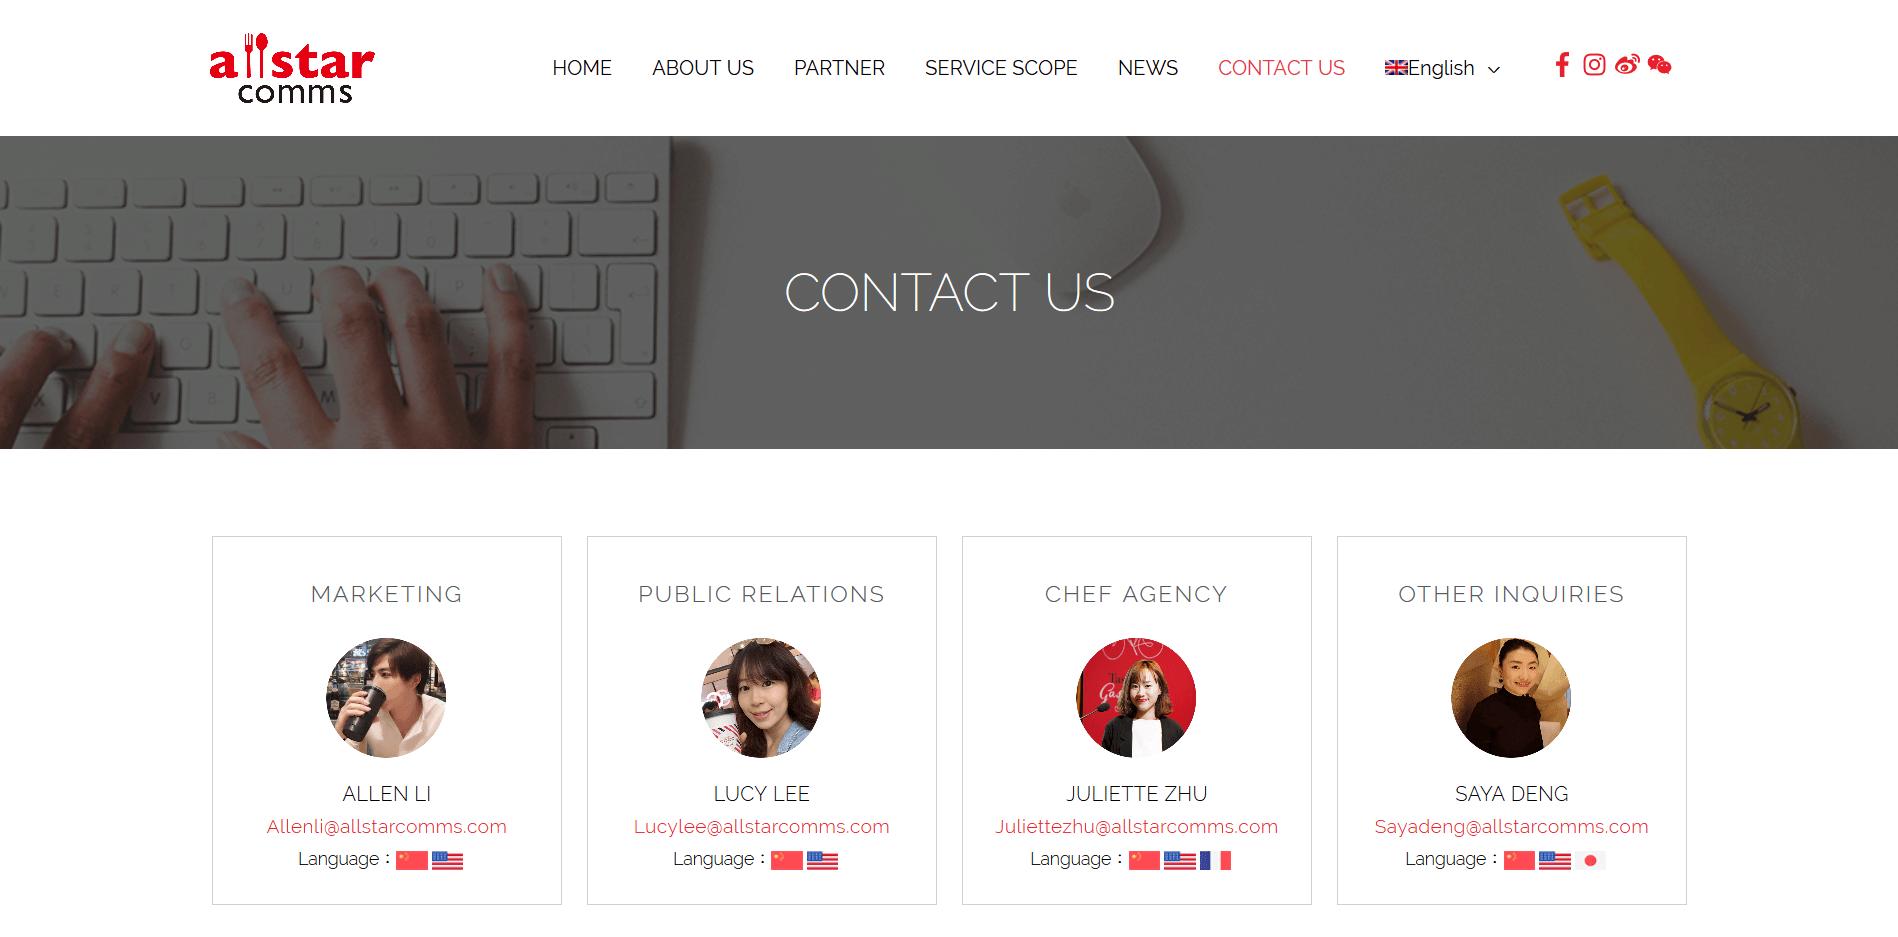 CONTACT US - 食达美食传播 Allstar Communications 专注高端餐饮的公关顾问